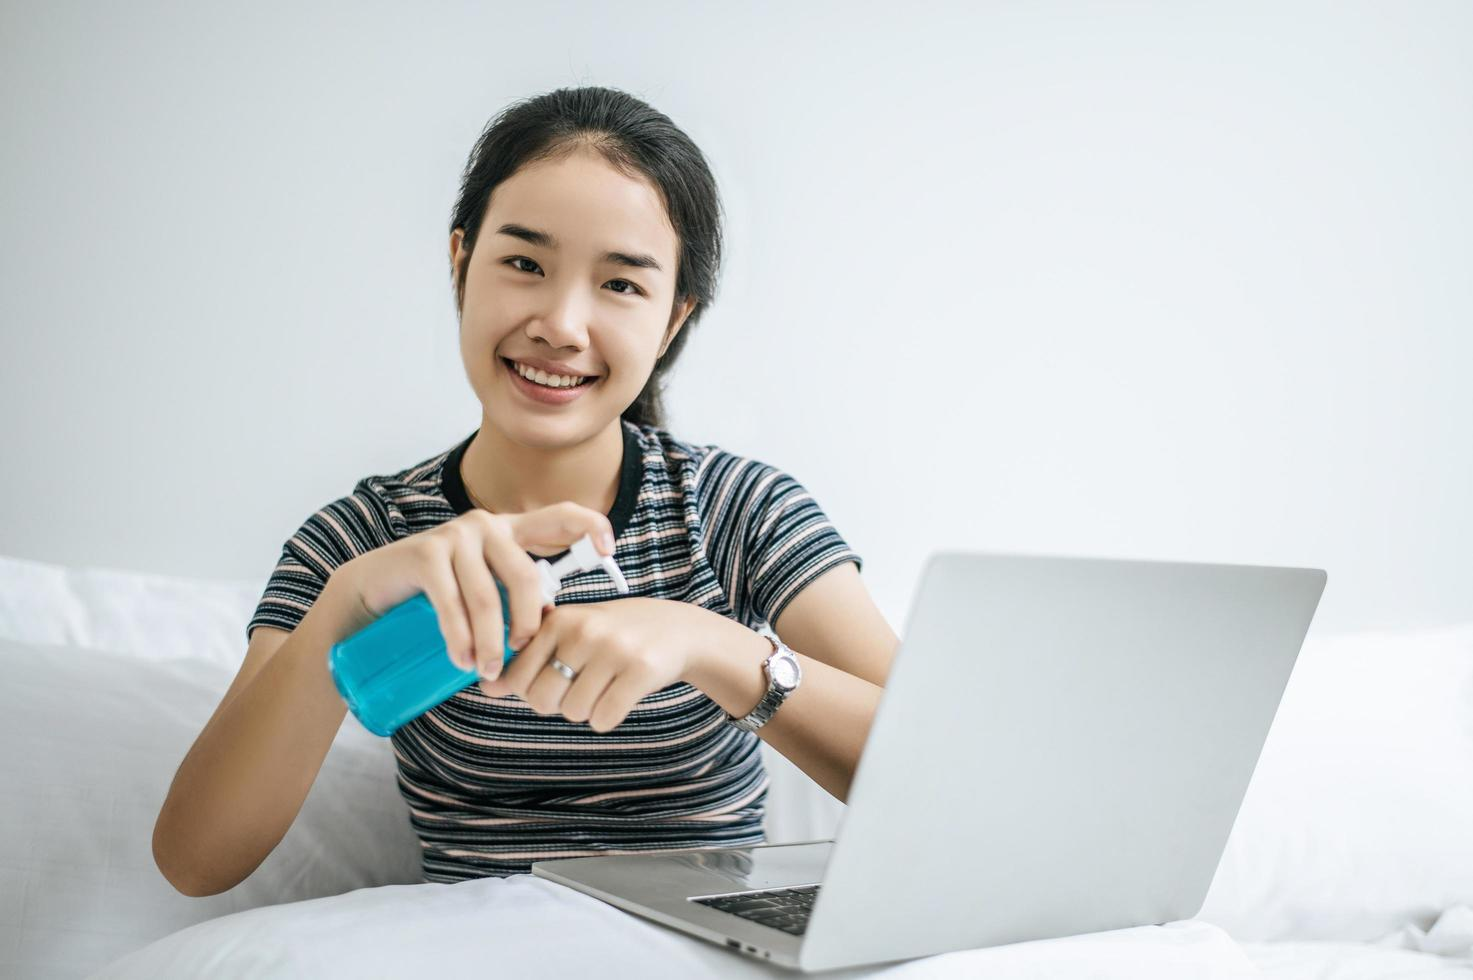 jeune femme, utilisation, gel lavage mains photo